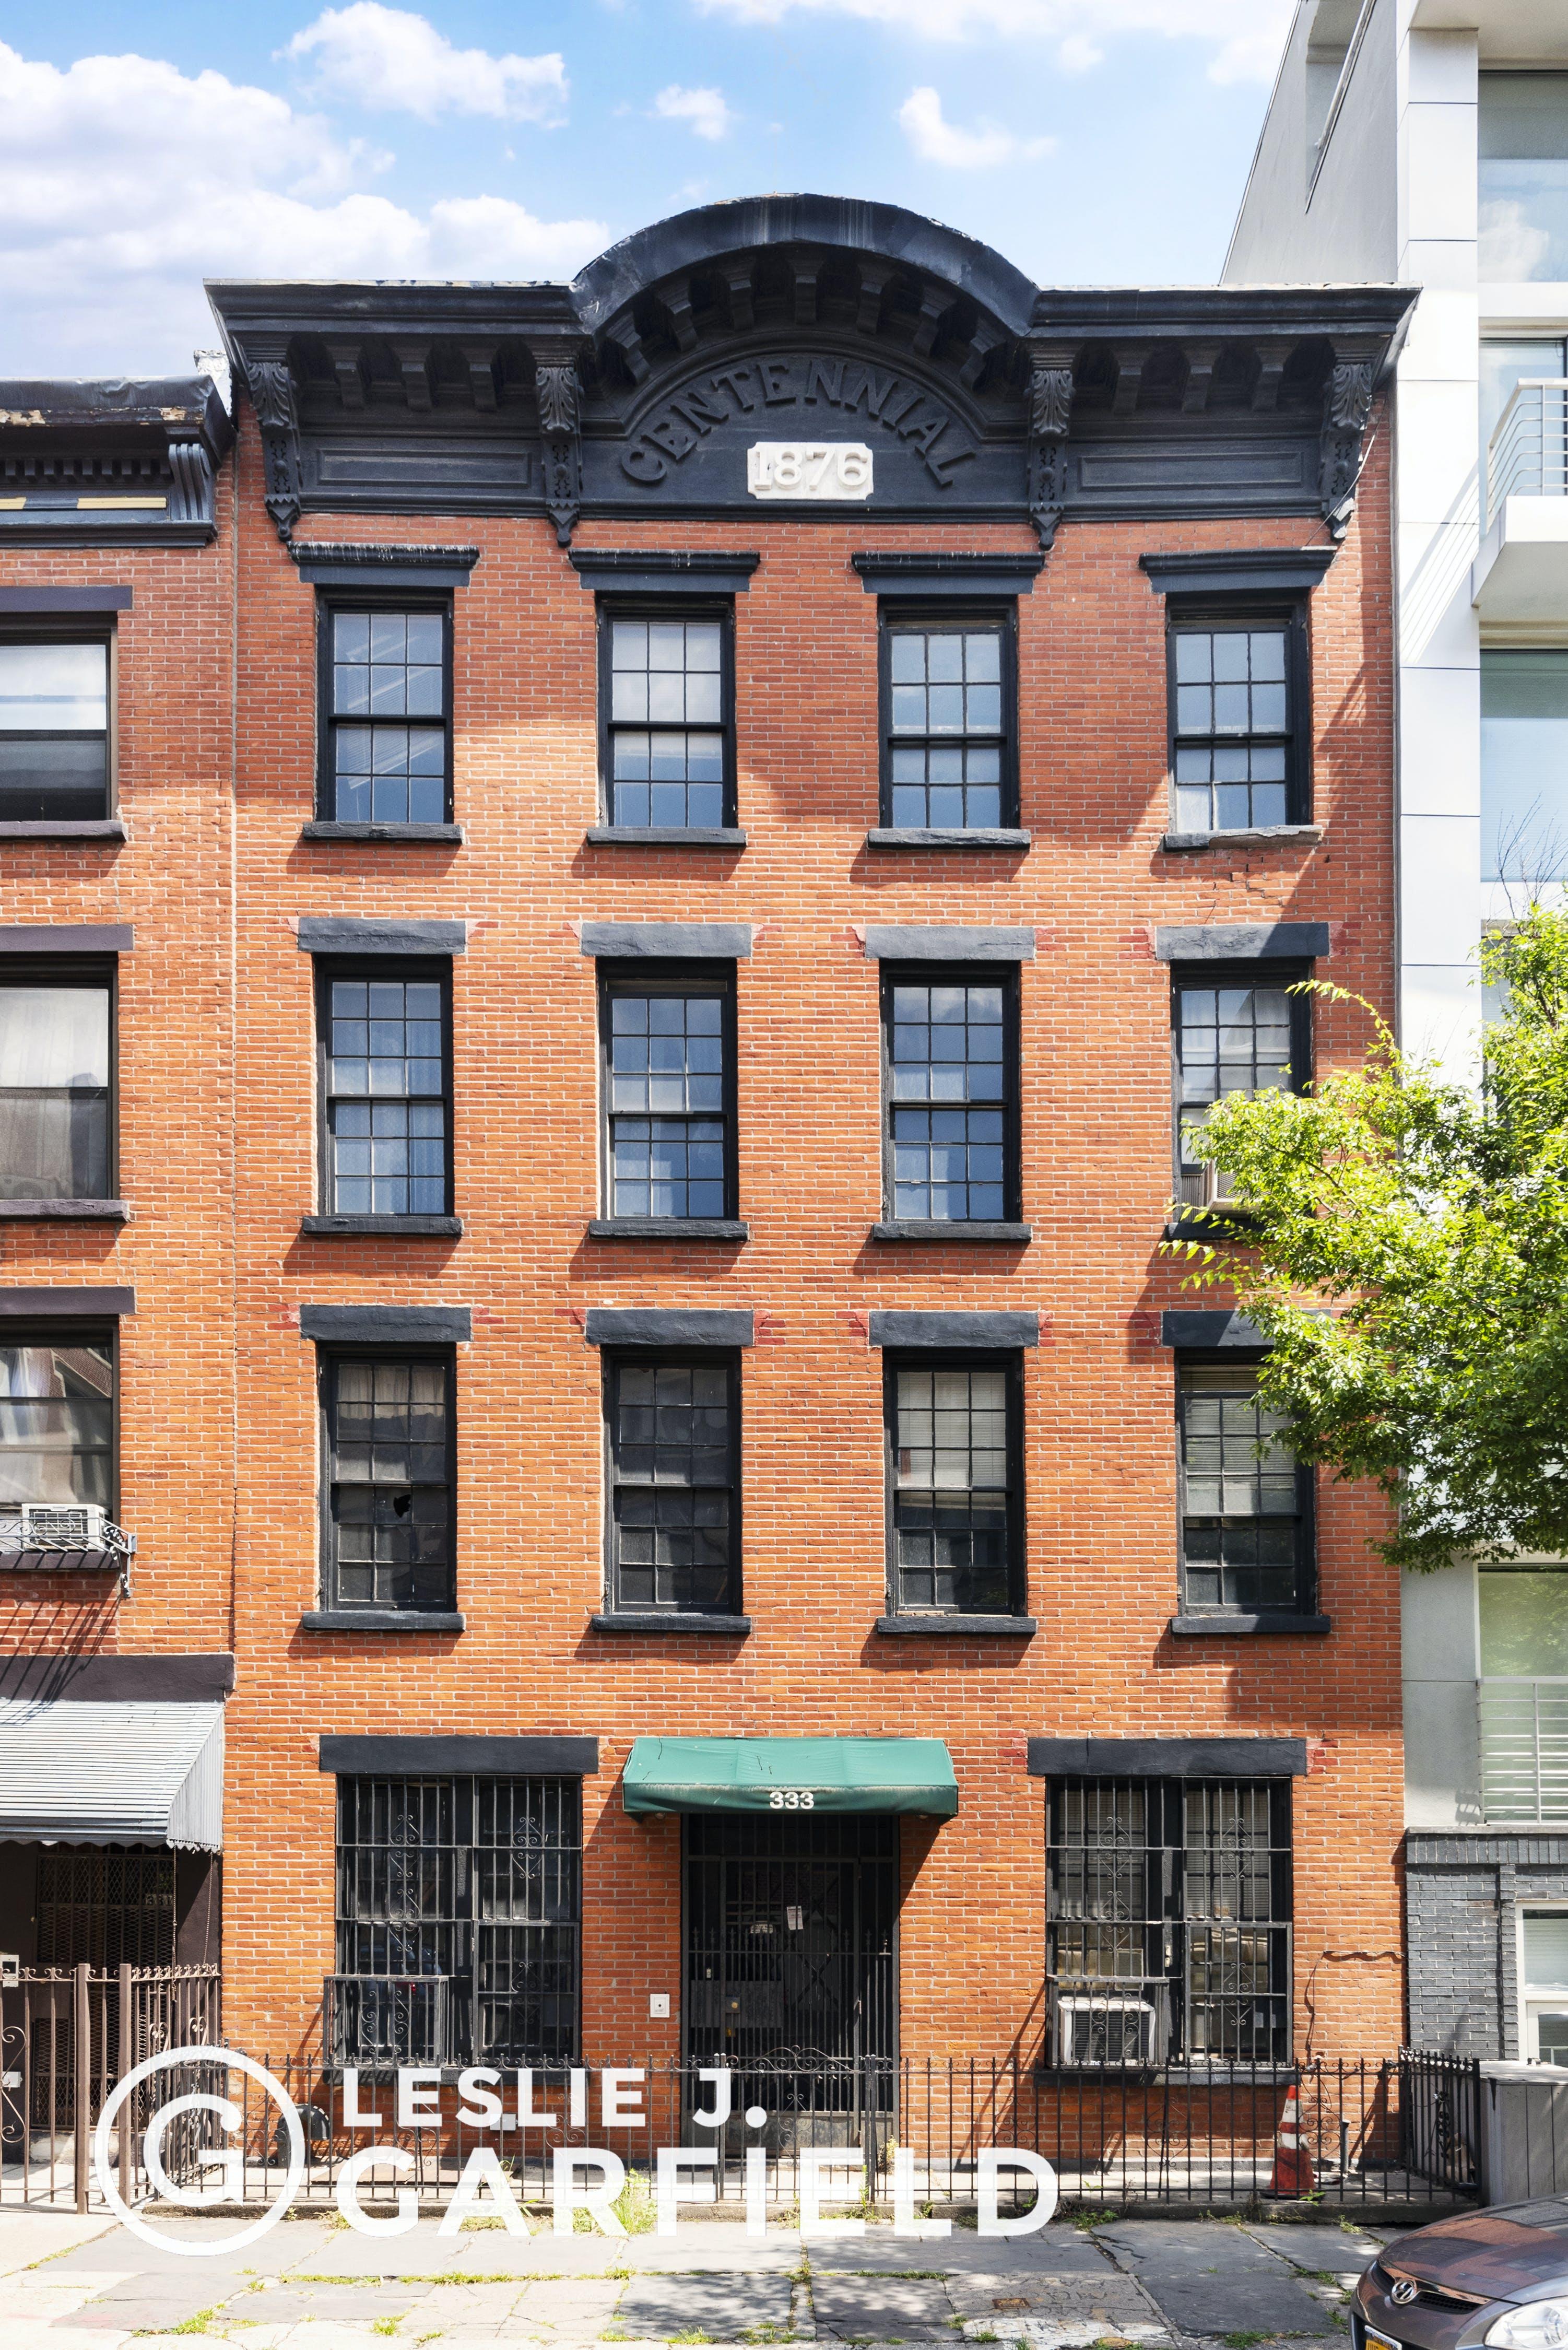 333 Warren Street - b9717650-7b0f-44d1-97c2-95e8df07873c - New York City Townhouse Real Estate